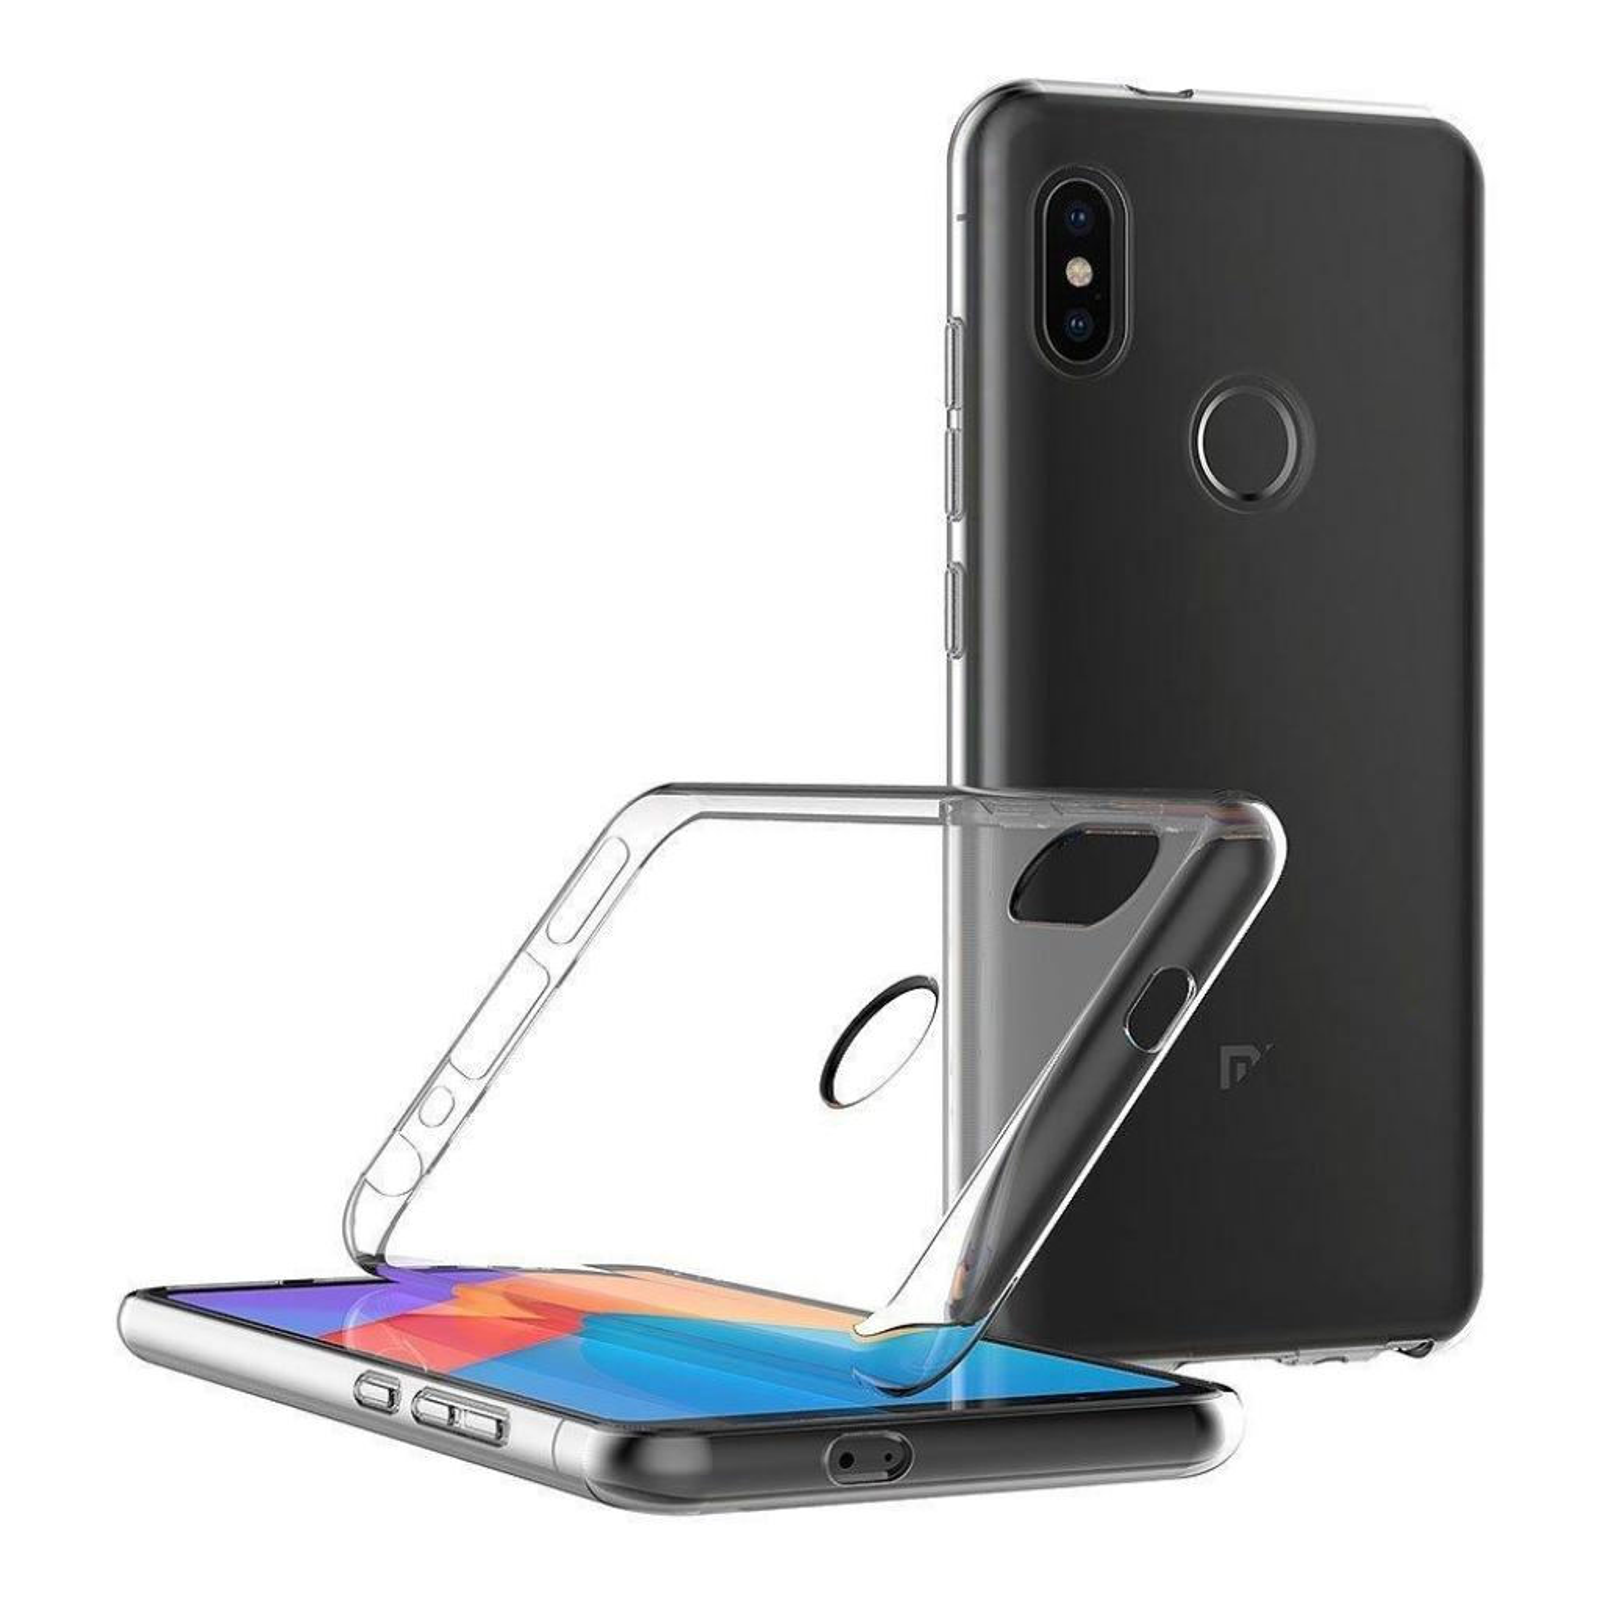 Чехол для моб. телефона Laudtec для Xiaomi Redmi Note 5 Pro Clear tpu (Transperent) (LC-XRN5P) изображение 3